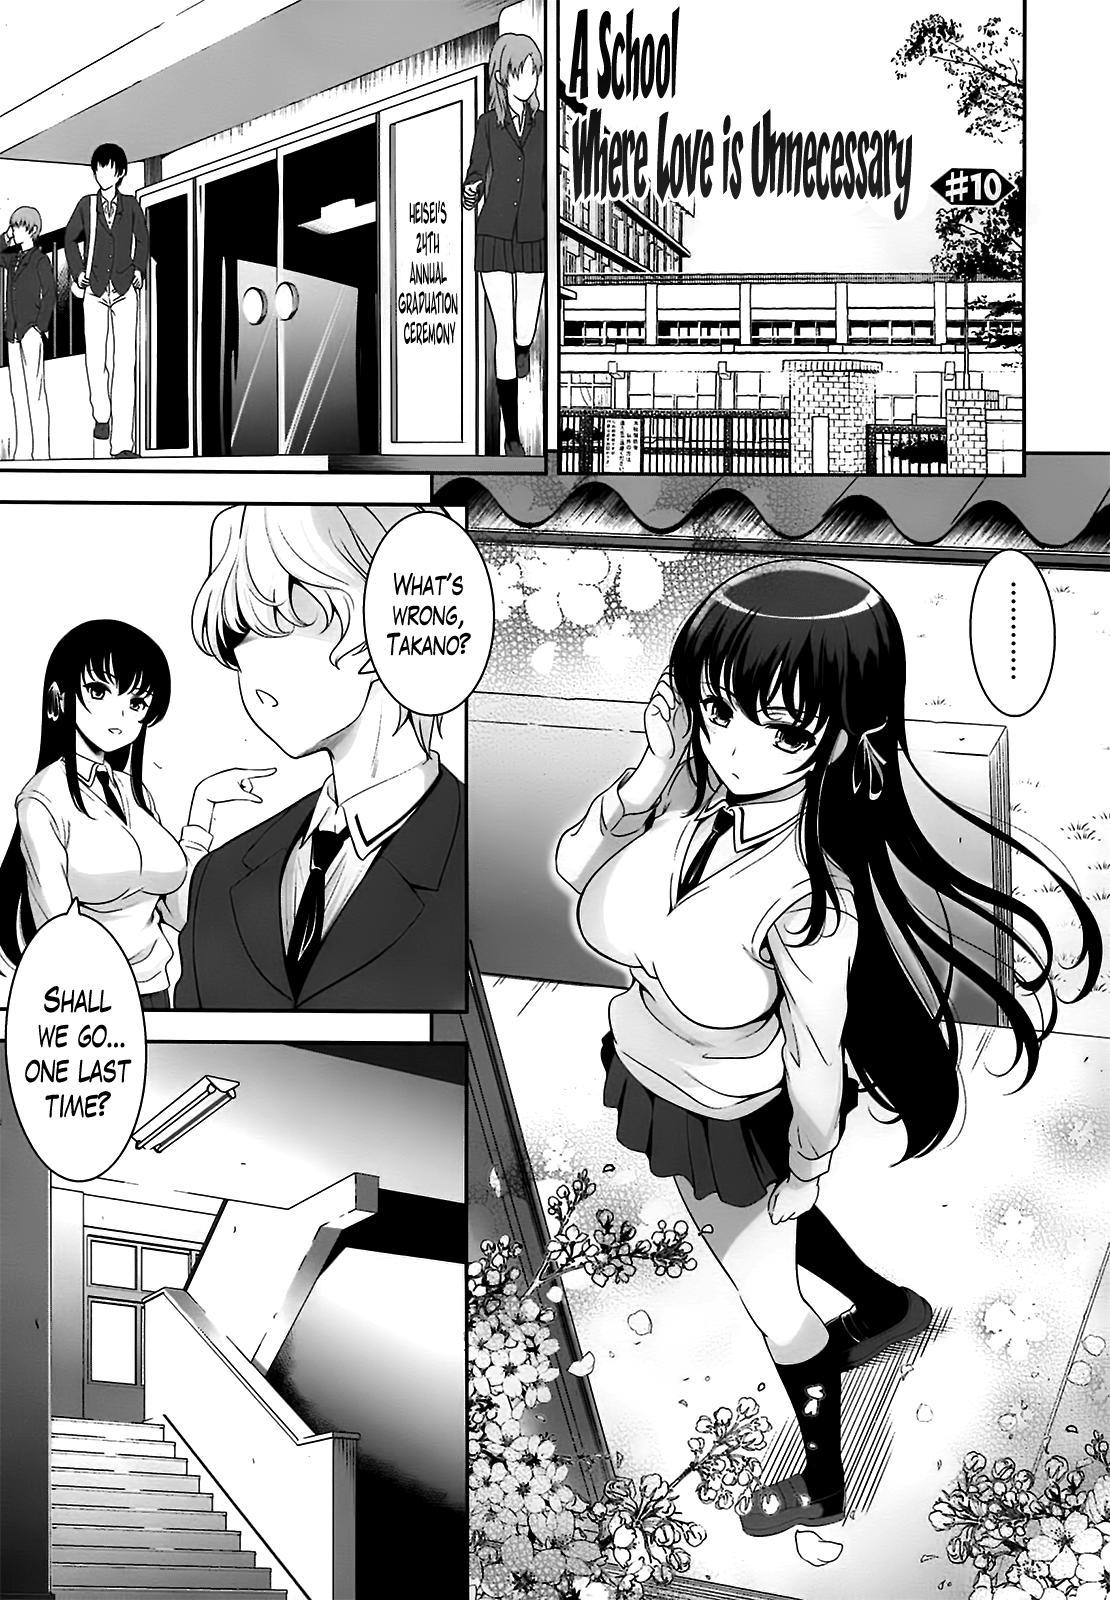 Renai Fuyou Gakuha   A School Where Love is Unnecessary 191